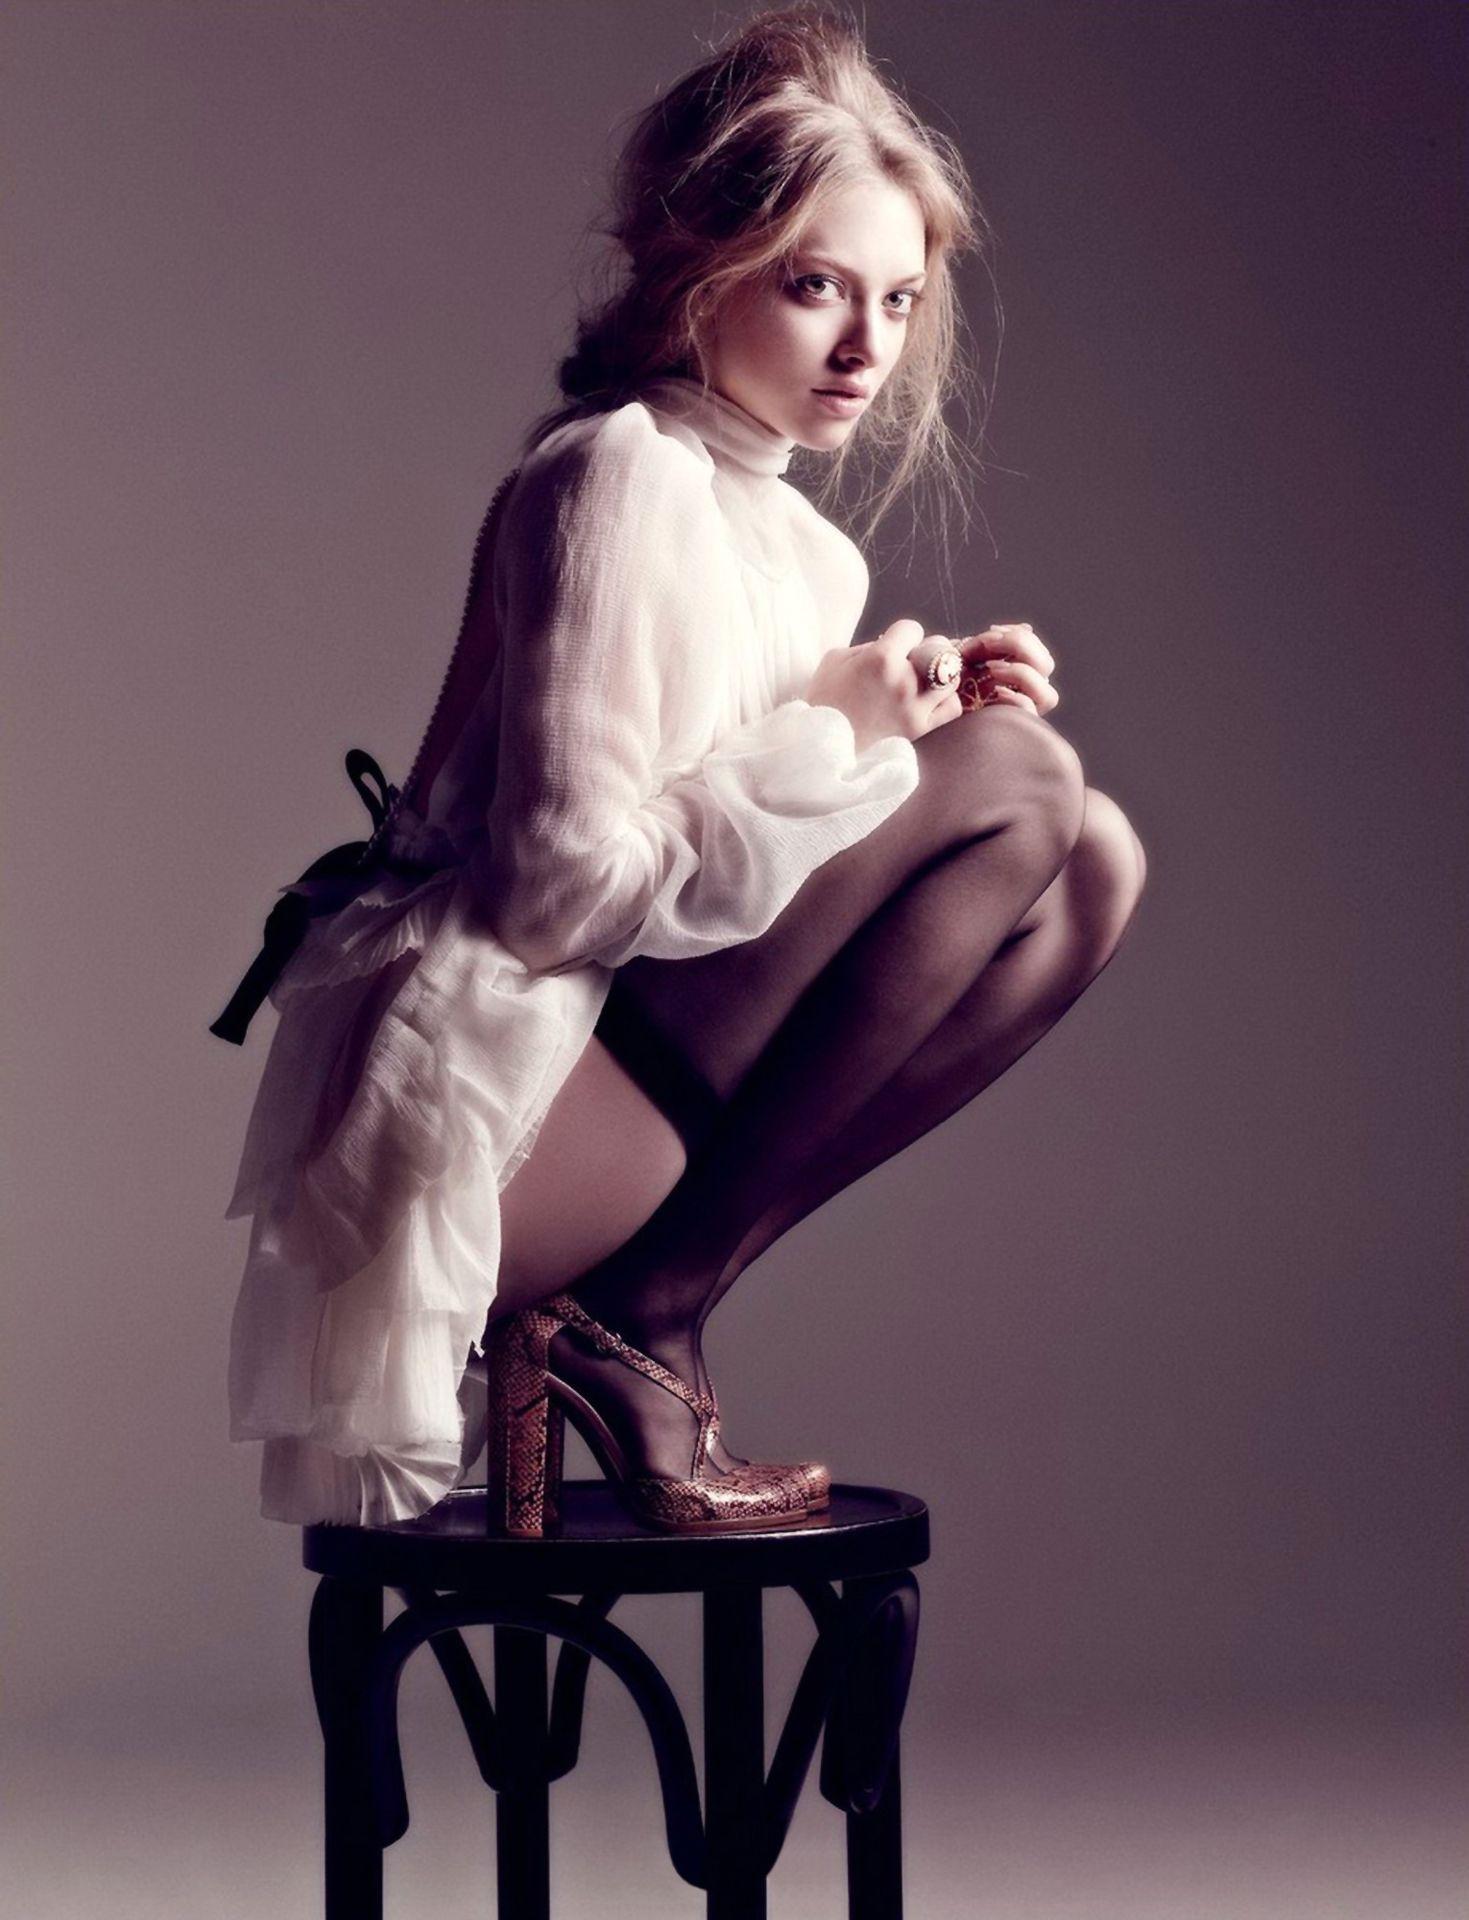 Amanda Seyfried Nude & Sexy 0003